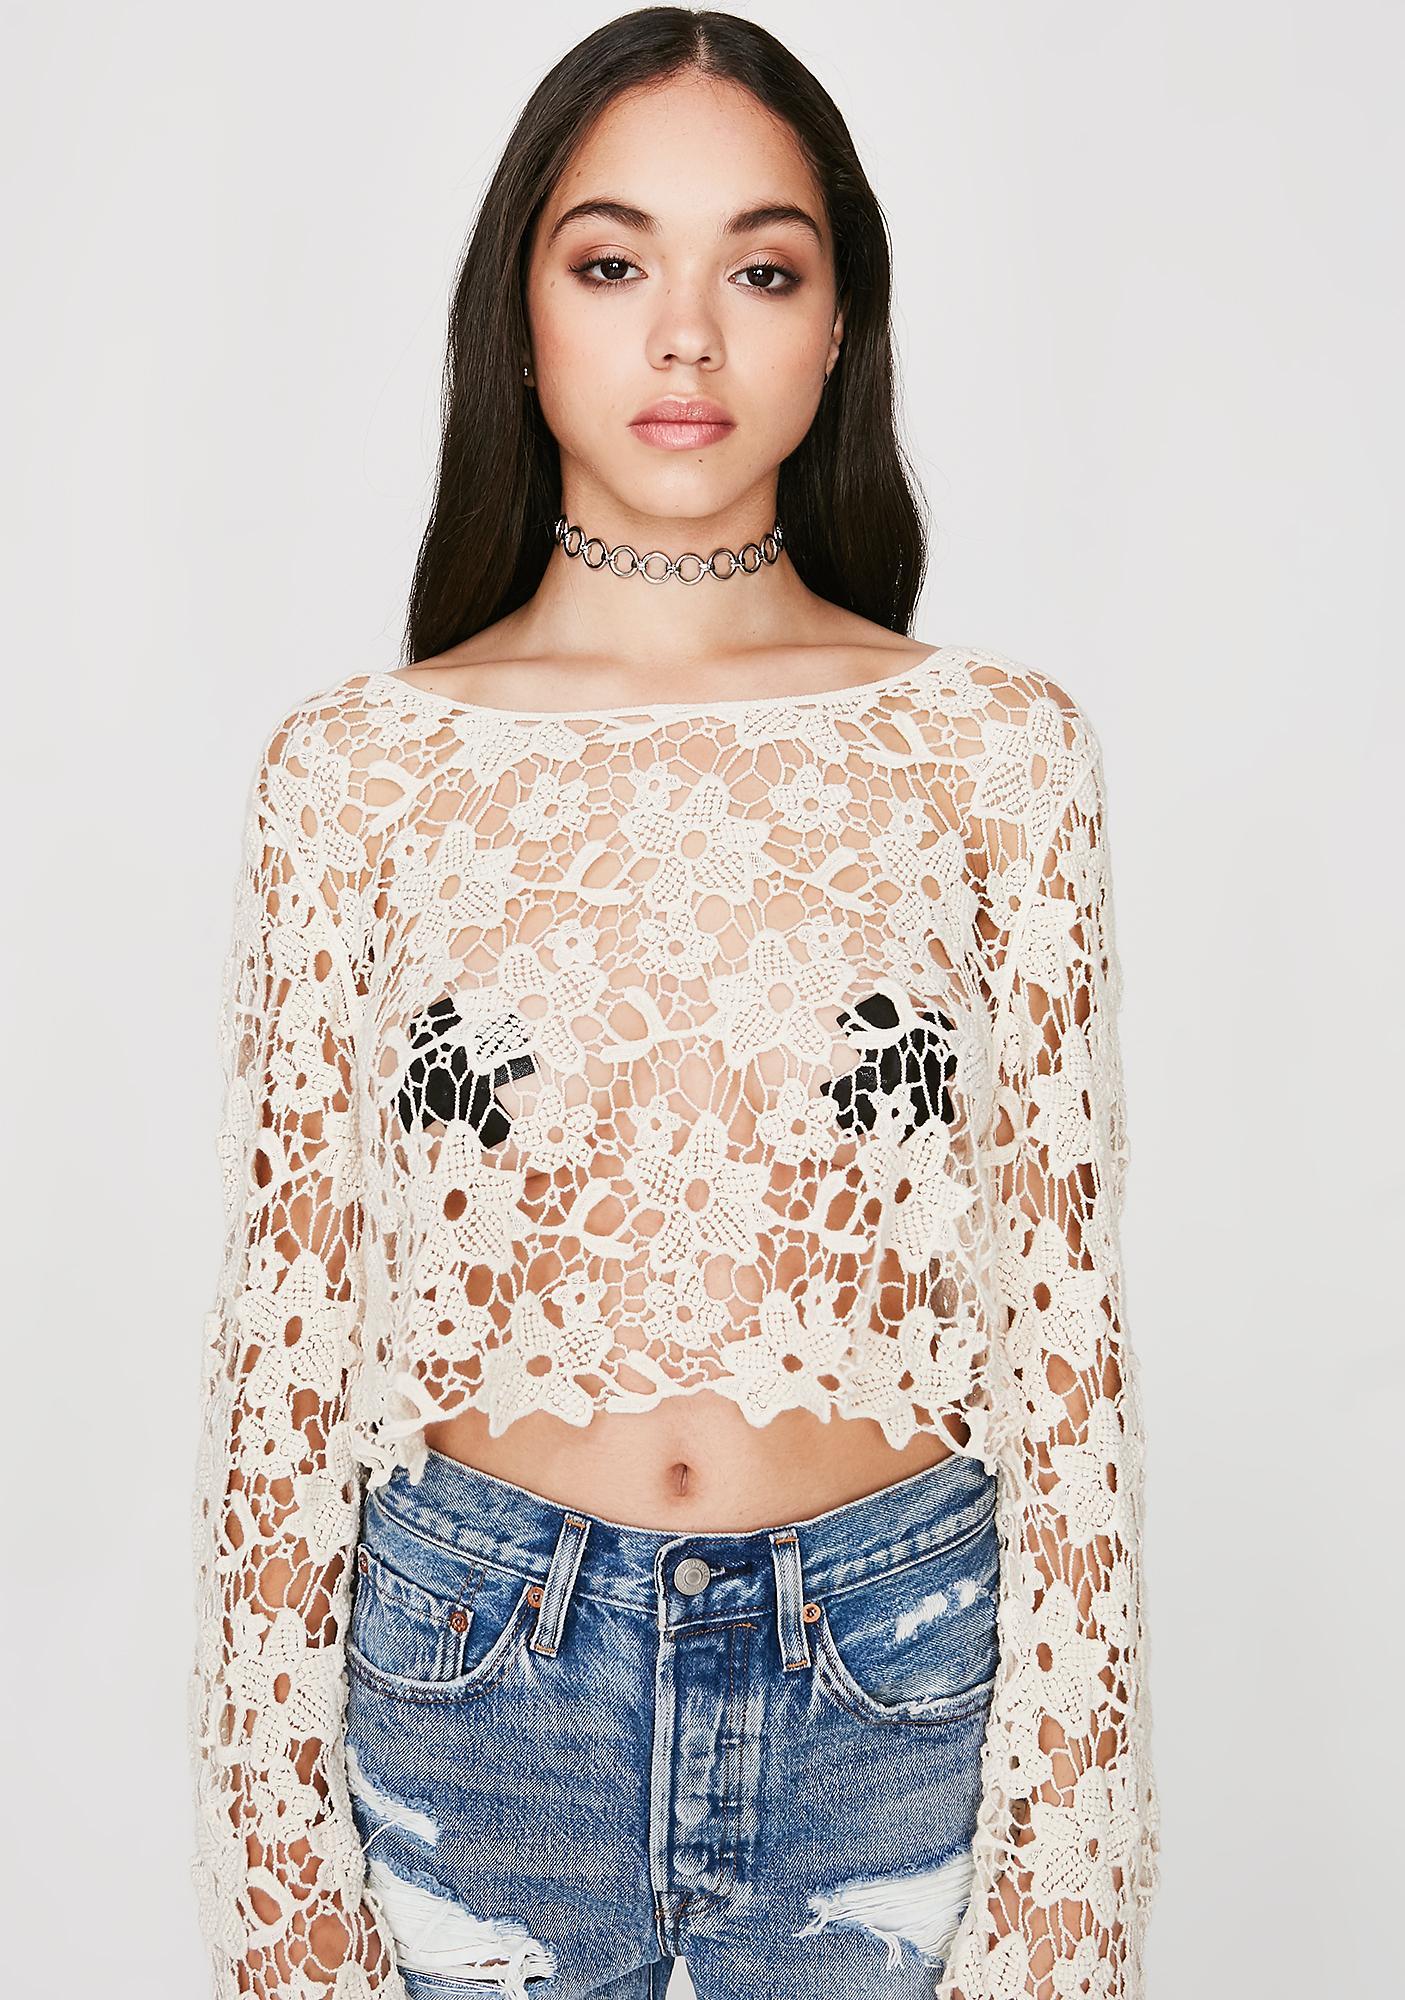 Poppin' Petals Crochet Top